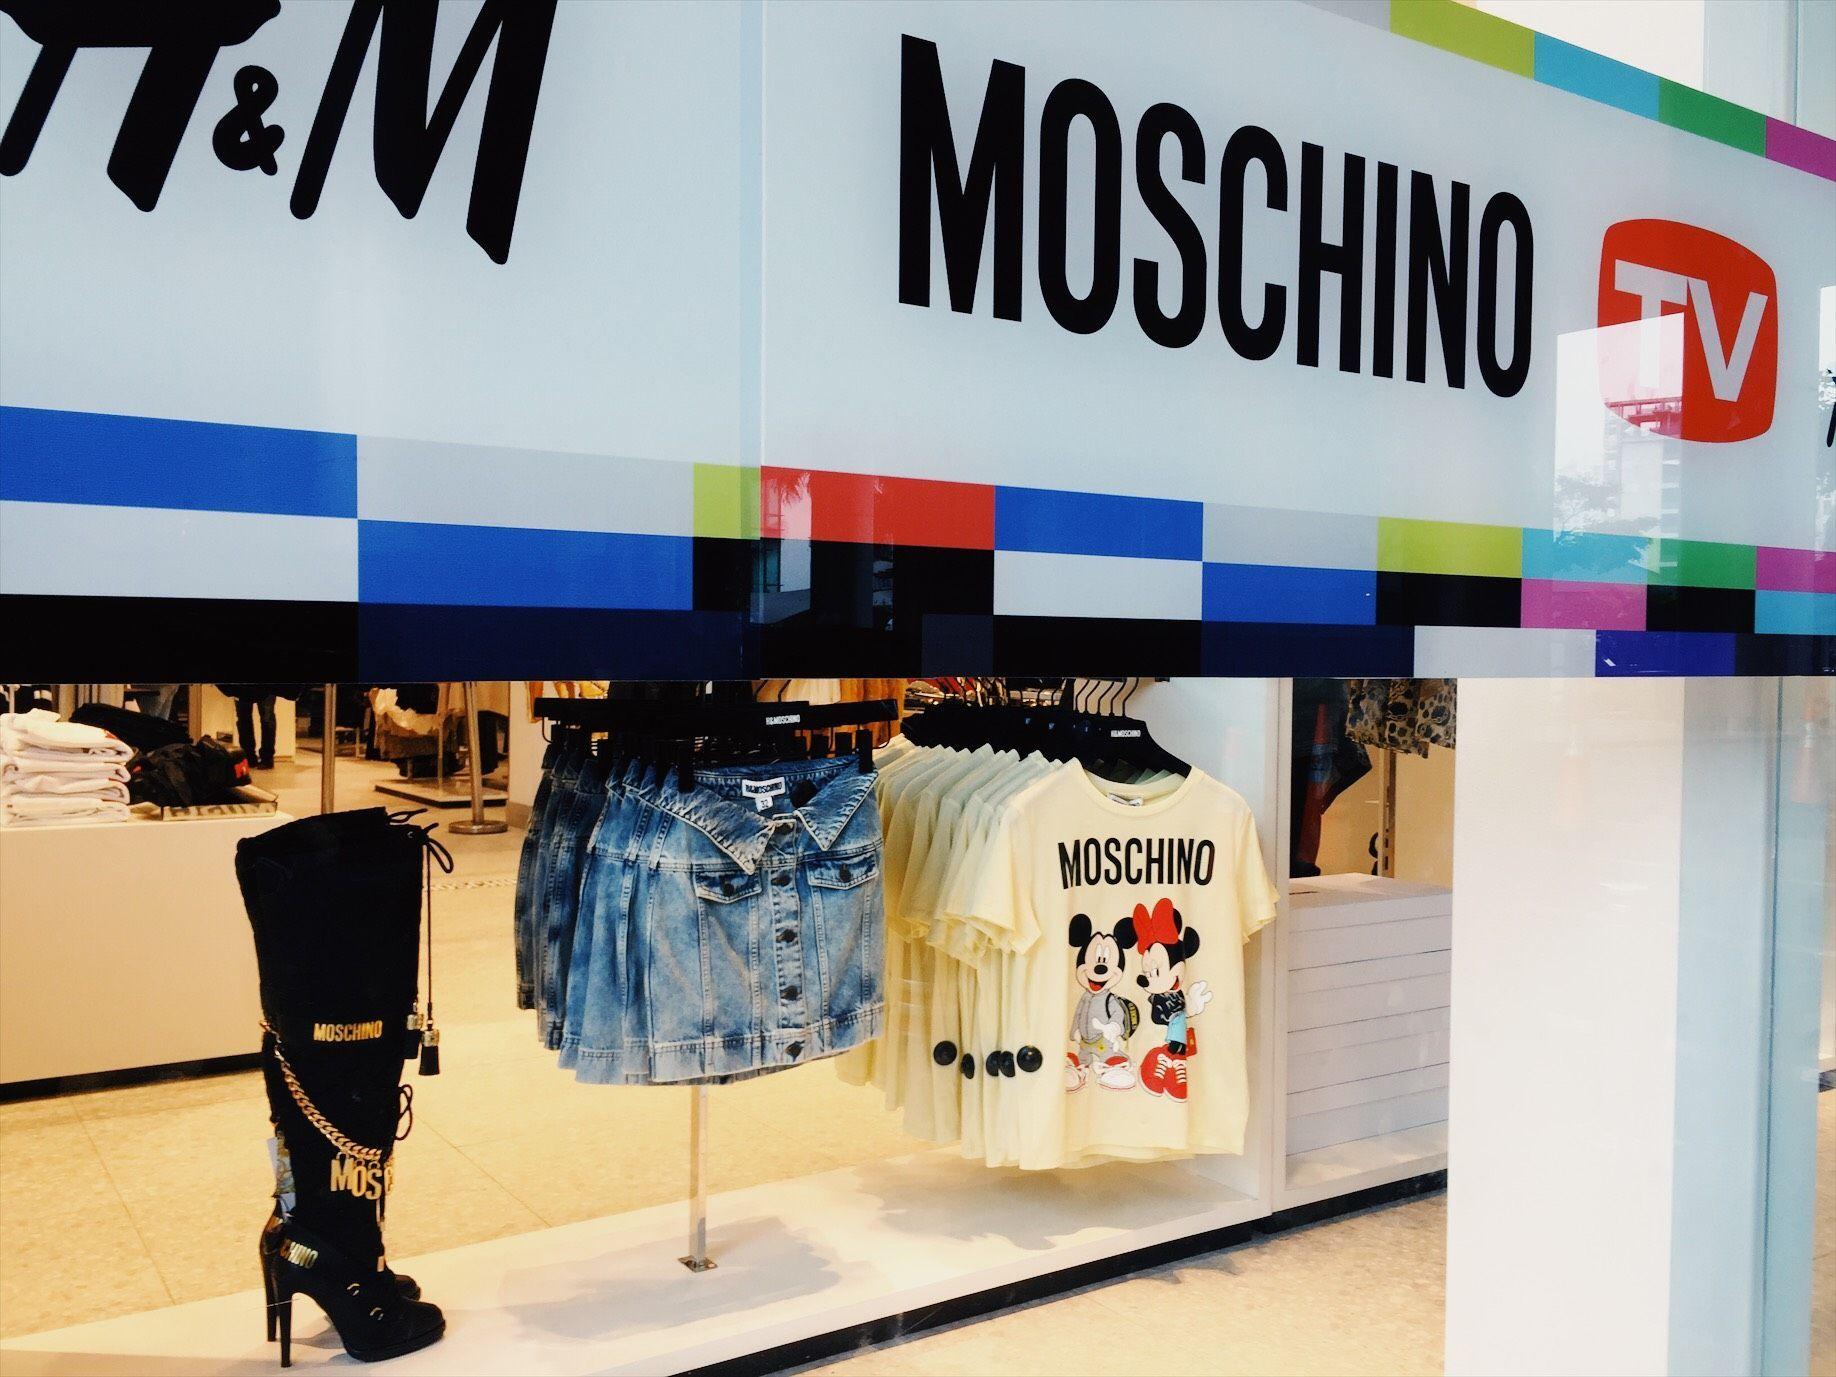 Ludes! Antusias Para PembeliMOSCHINO [tv] H&M di Indonesia